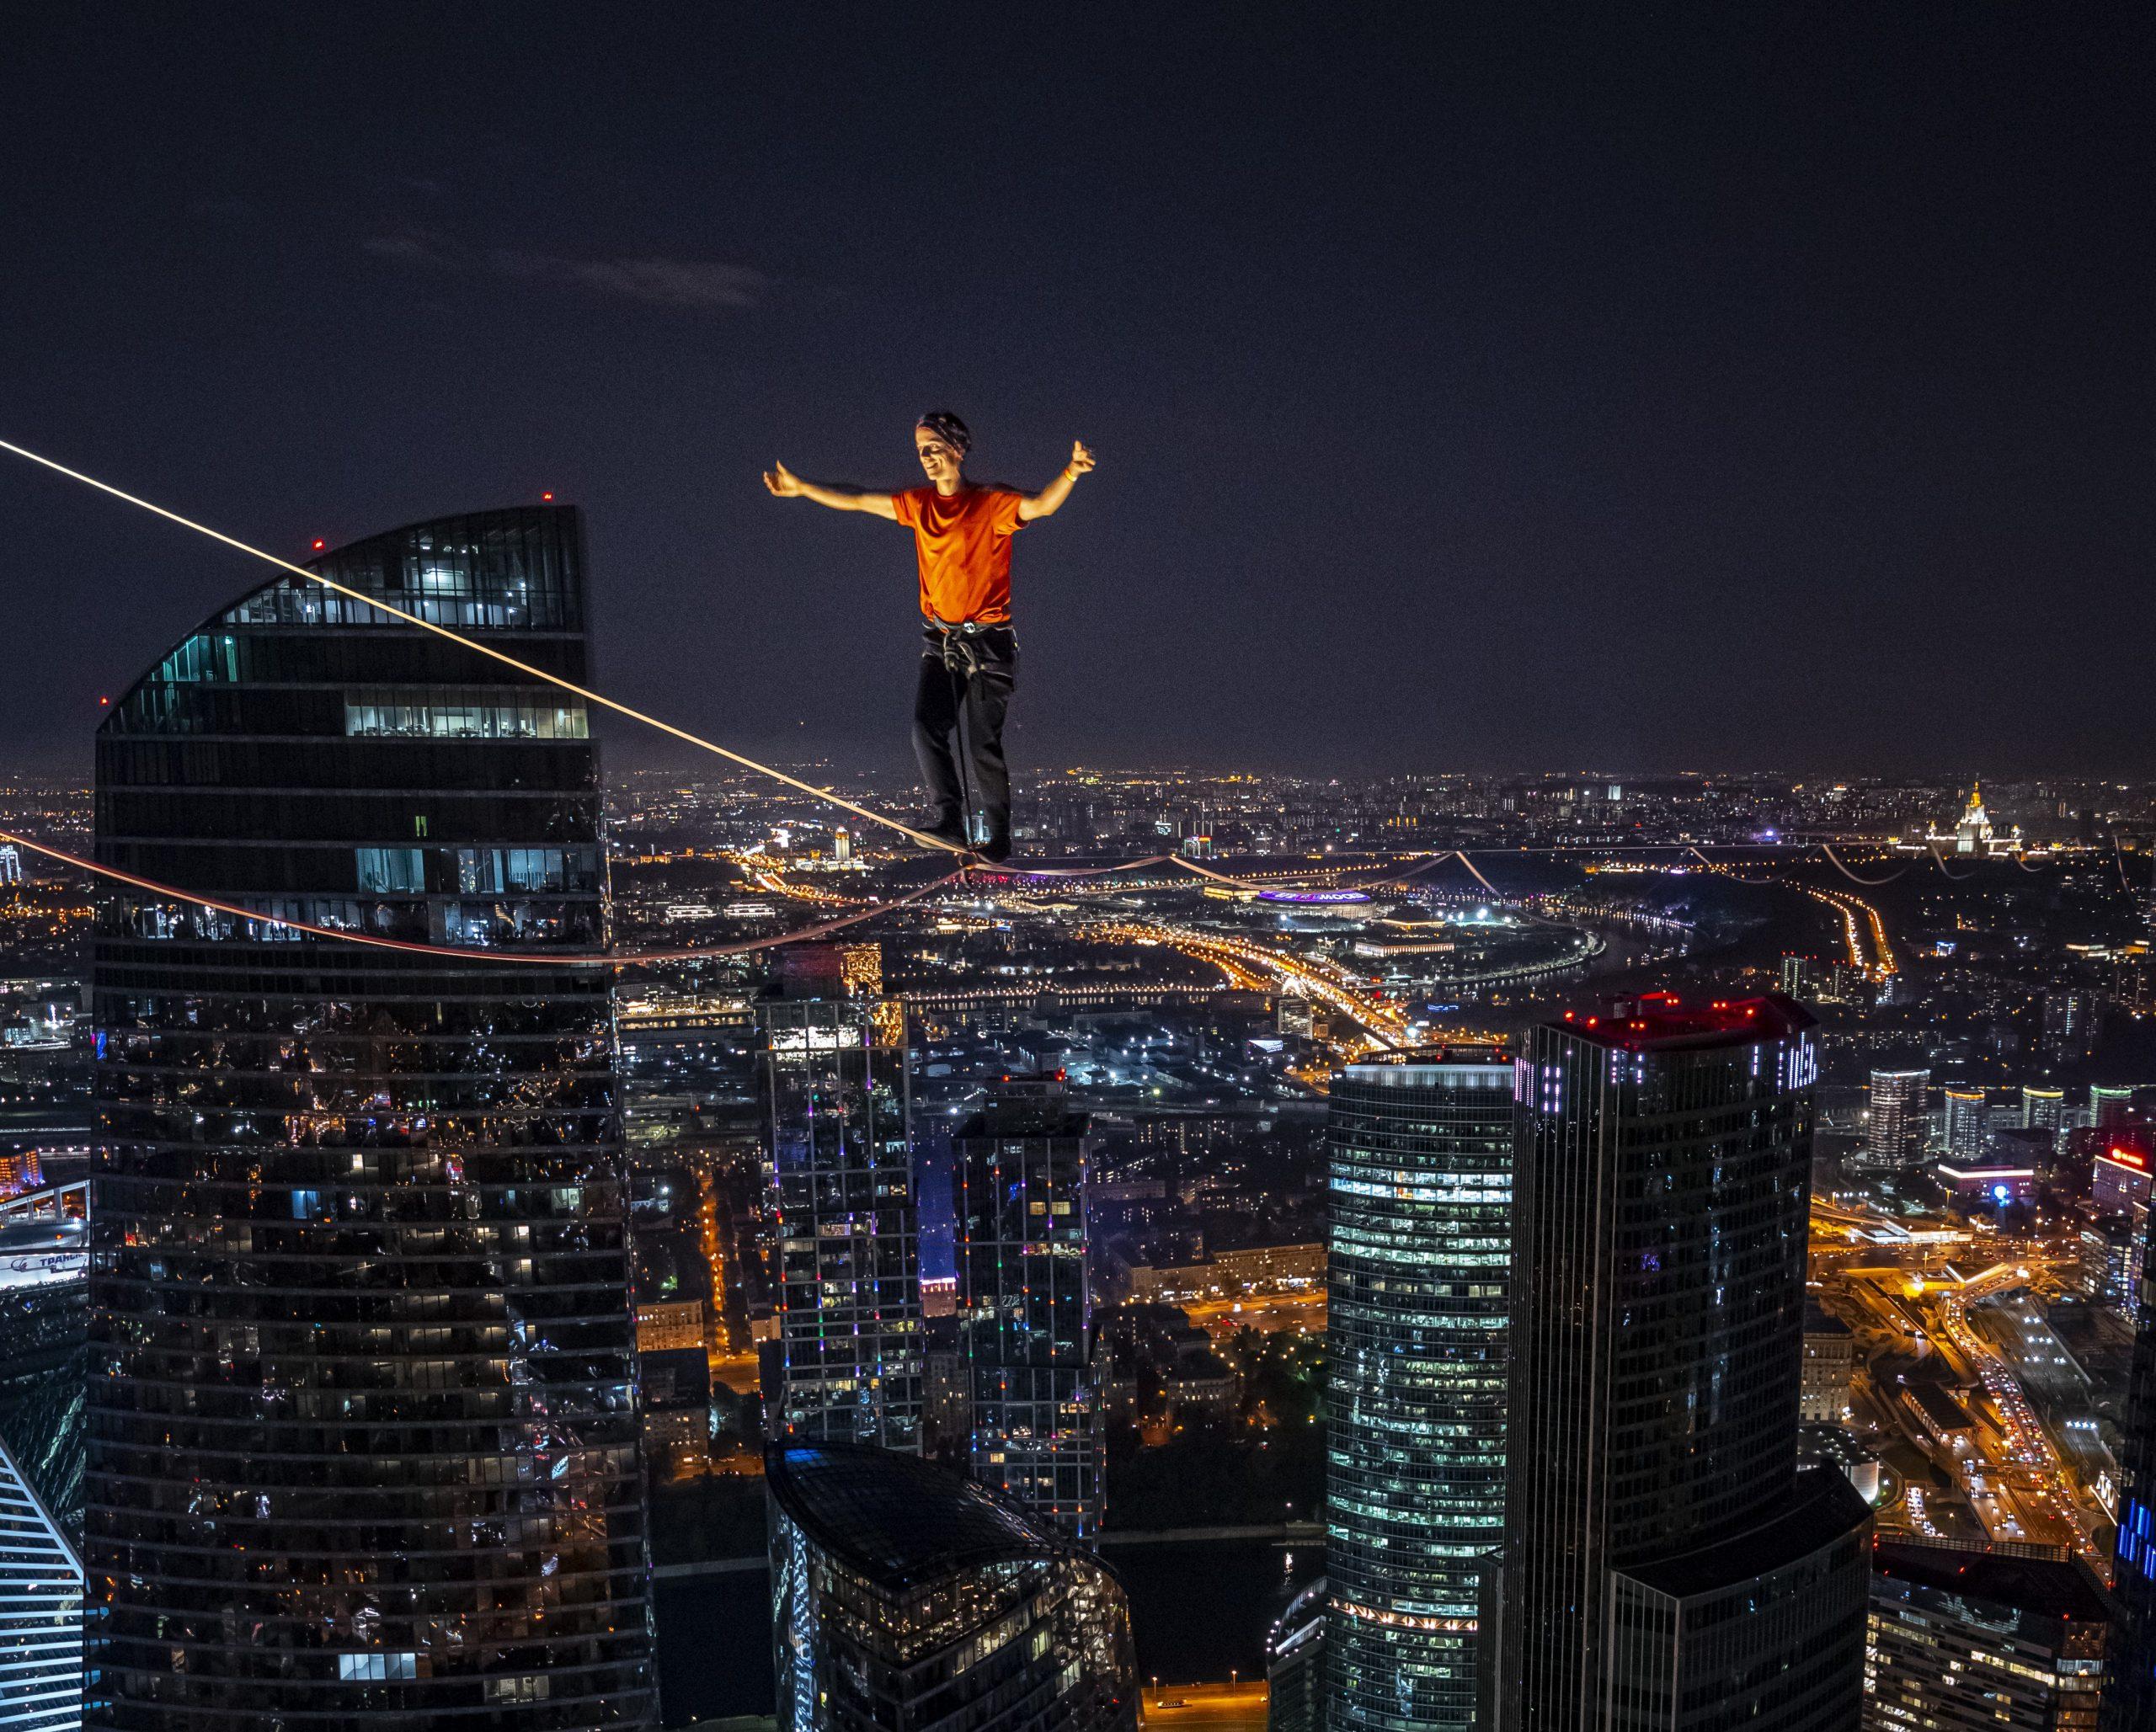 slackline highline friedi kühne moscow moskau urban world record guinness weltrekord oko tower